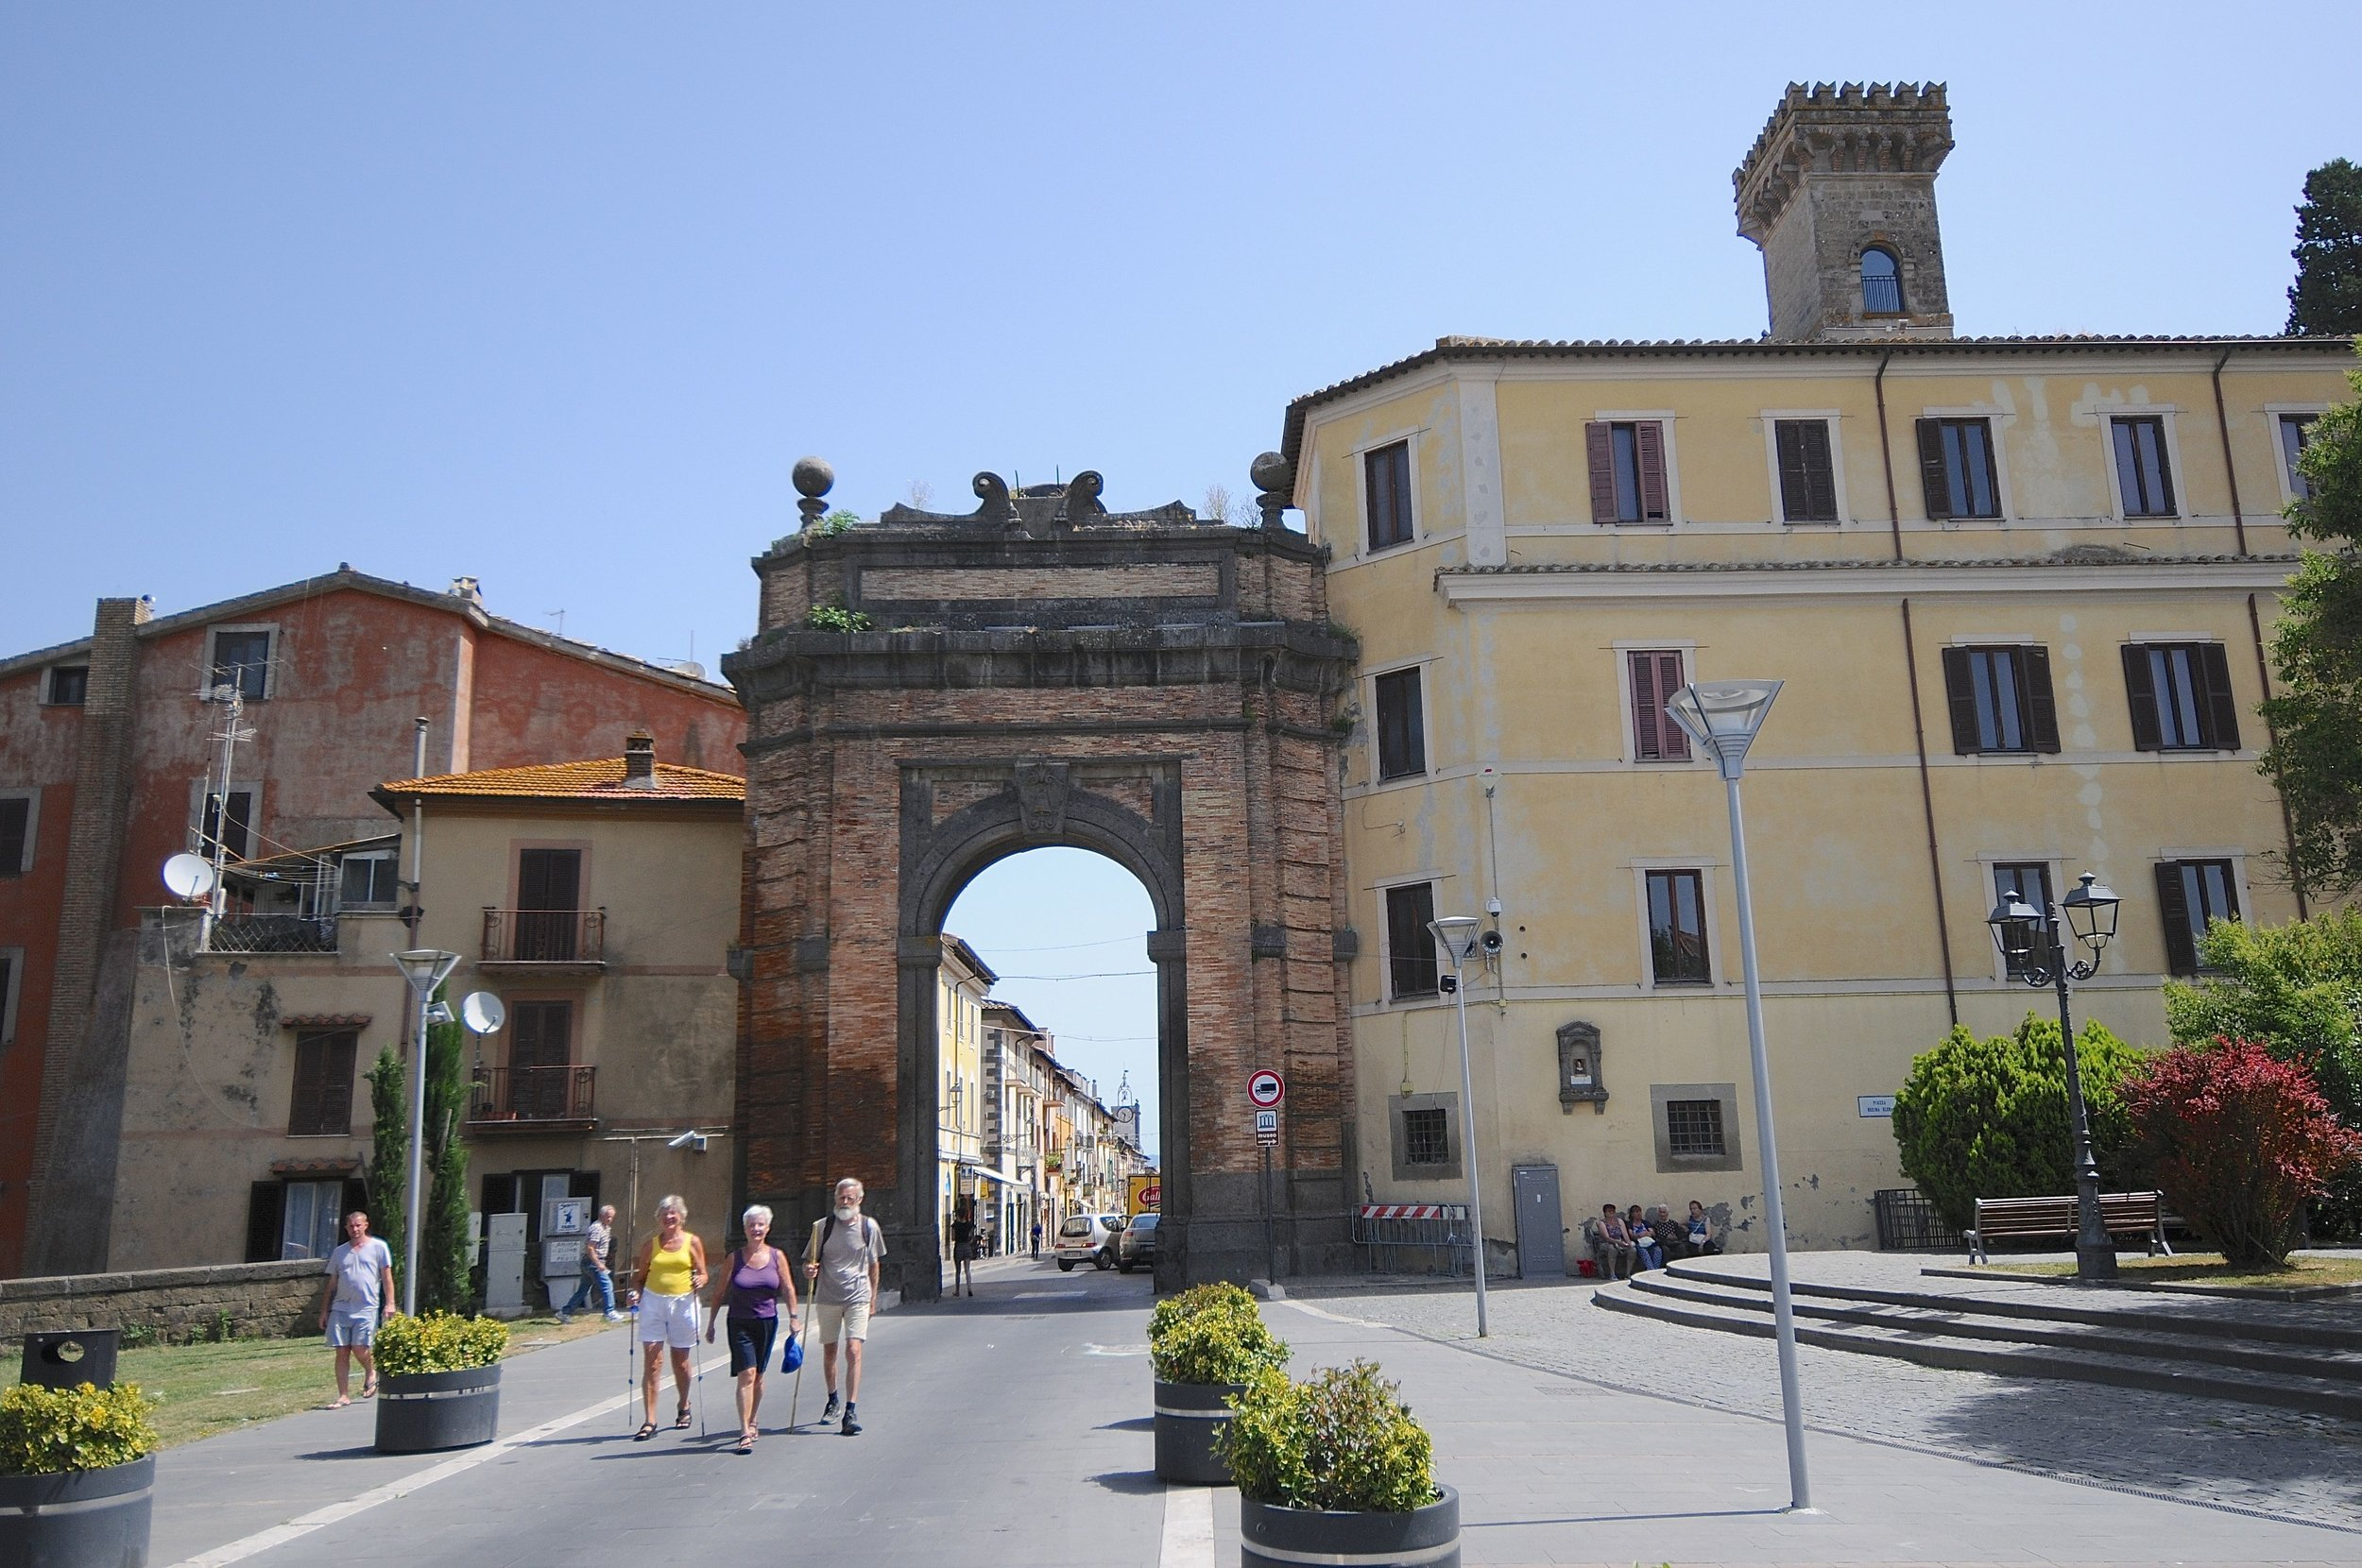 Campagnano di Roma - Porta Romano Foto Kjell Helle-Olsen (1).jpg